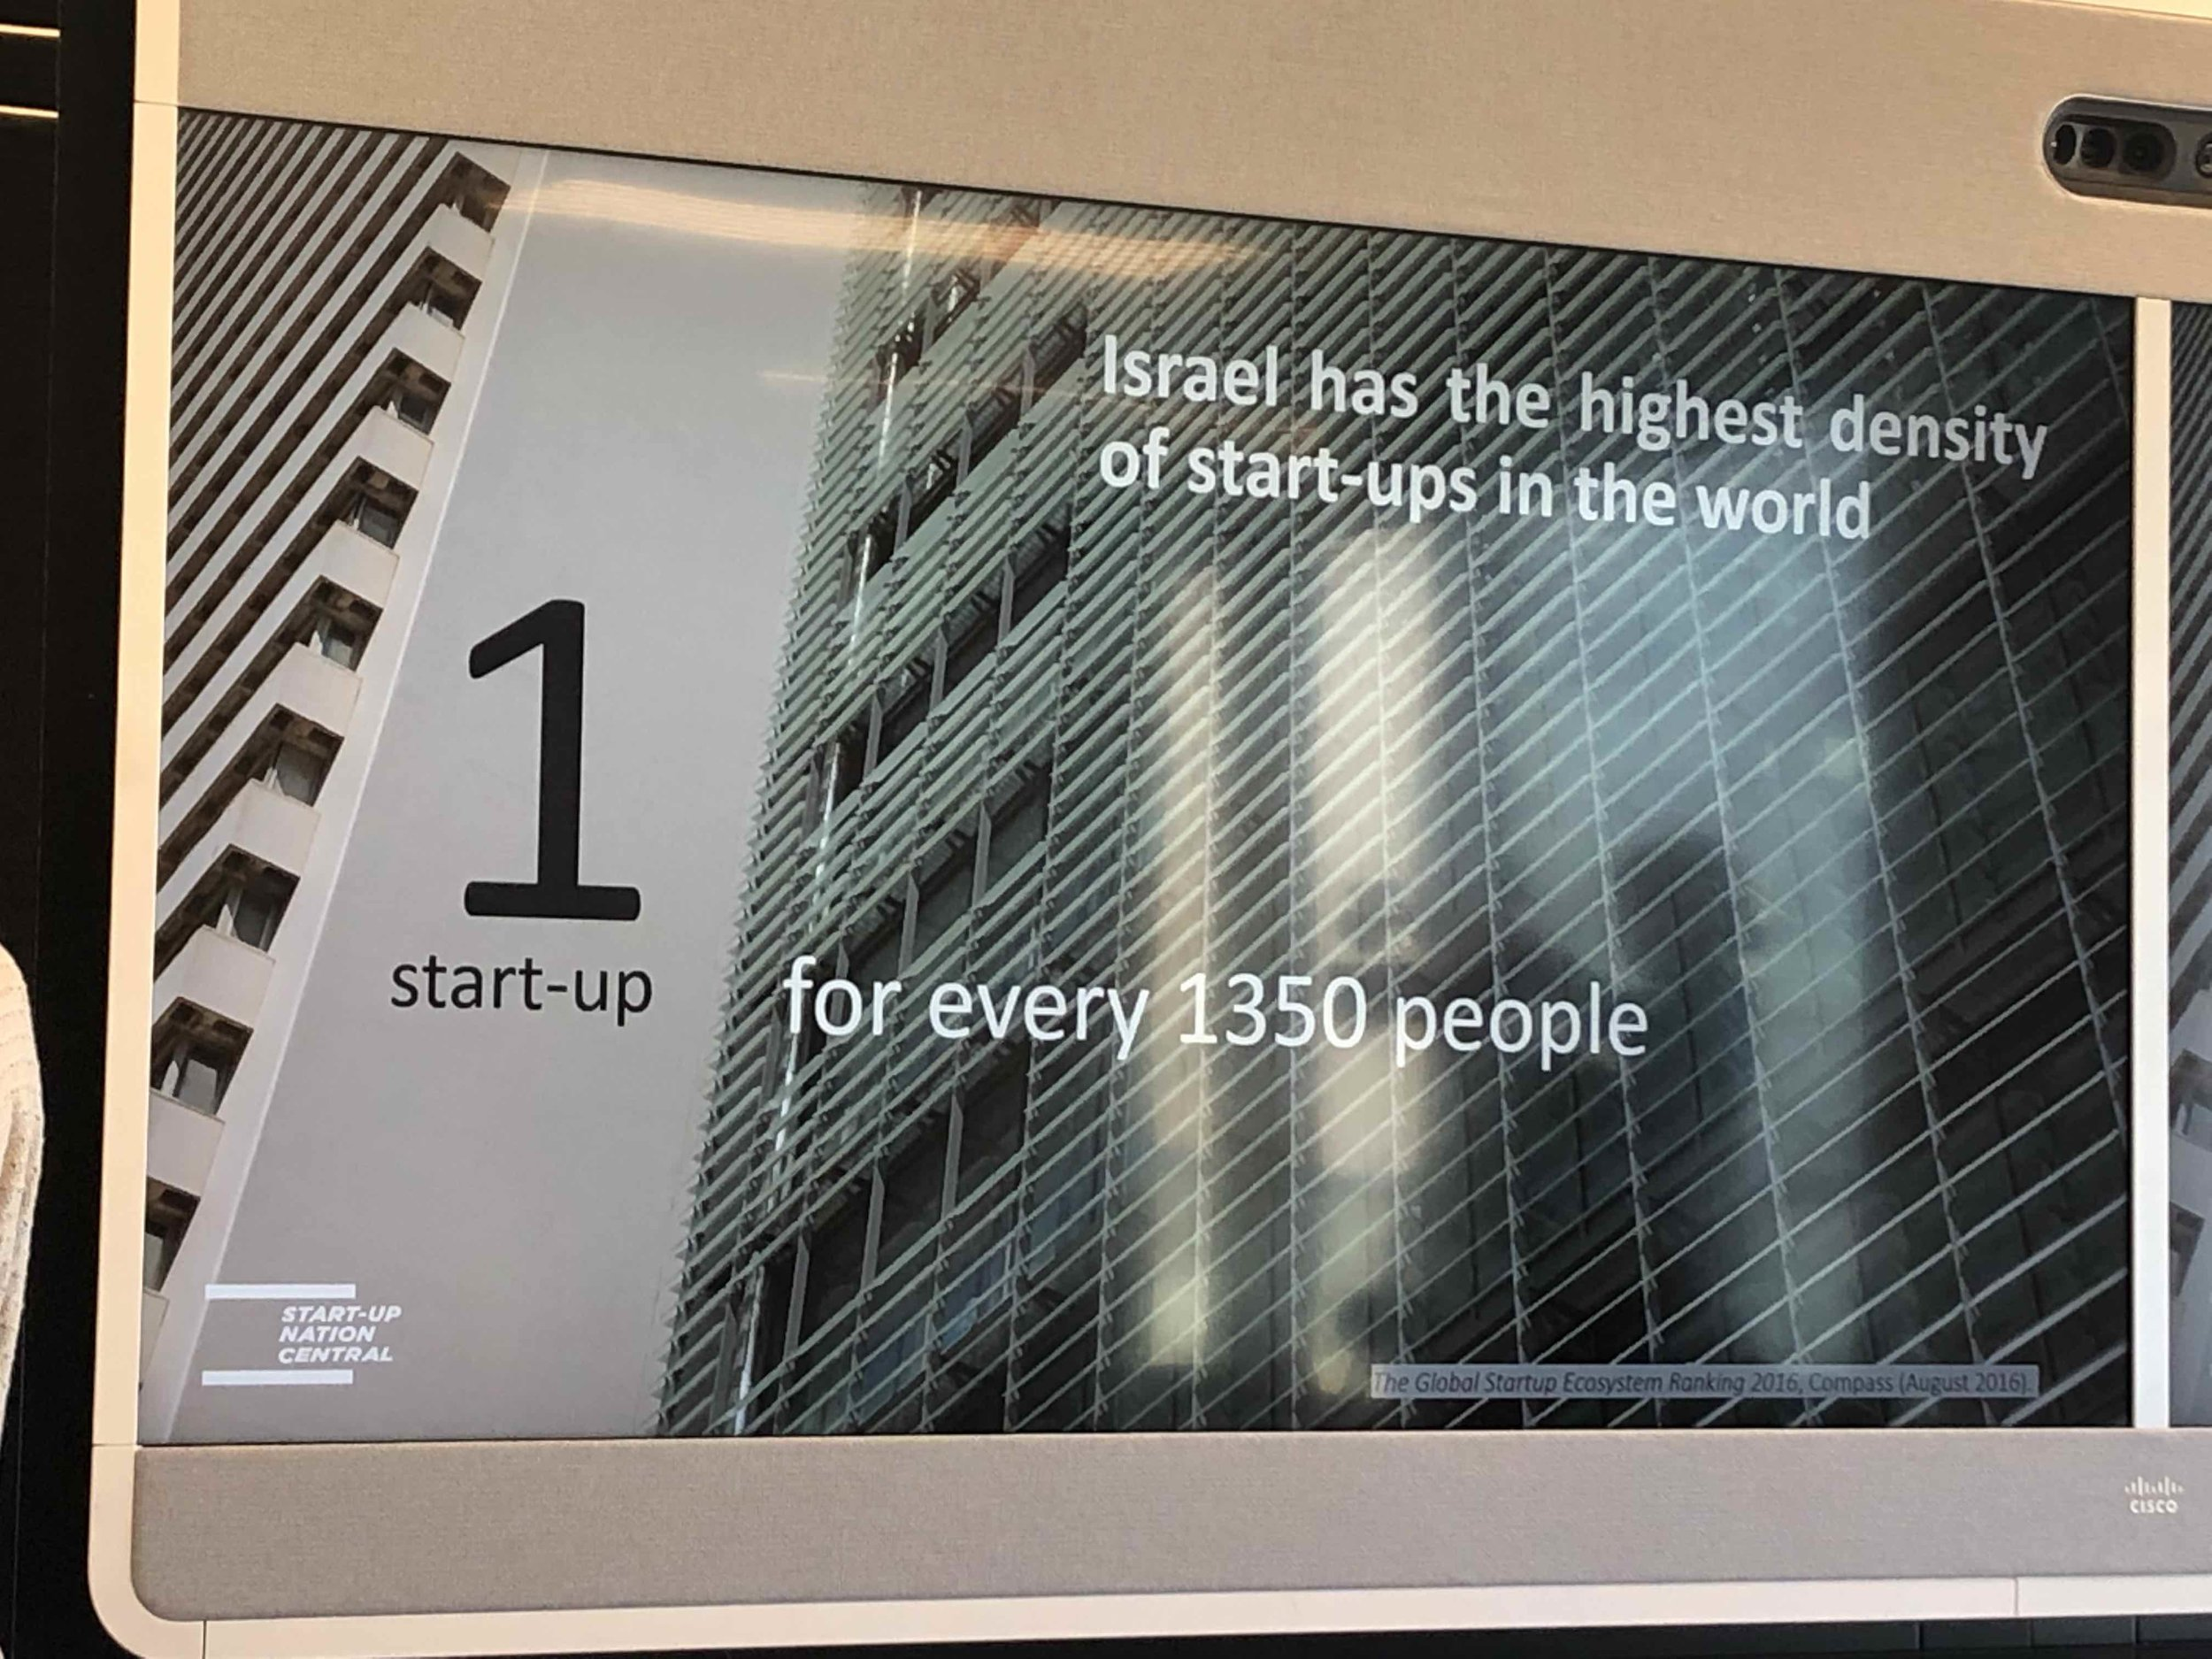 Israel leads the world in start-ups per capita.